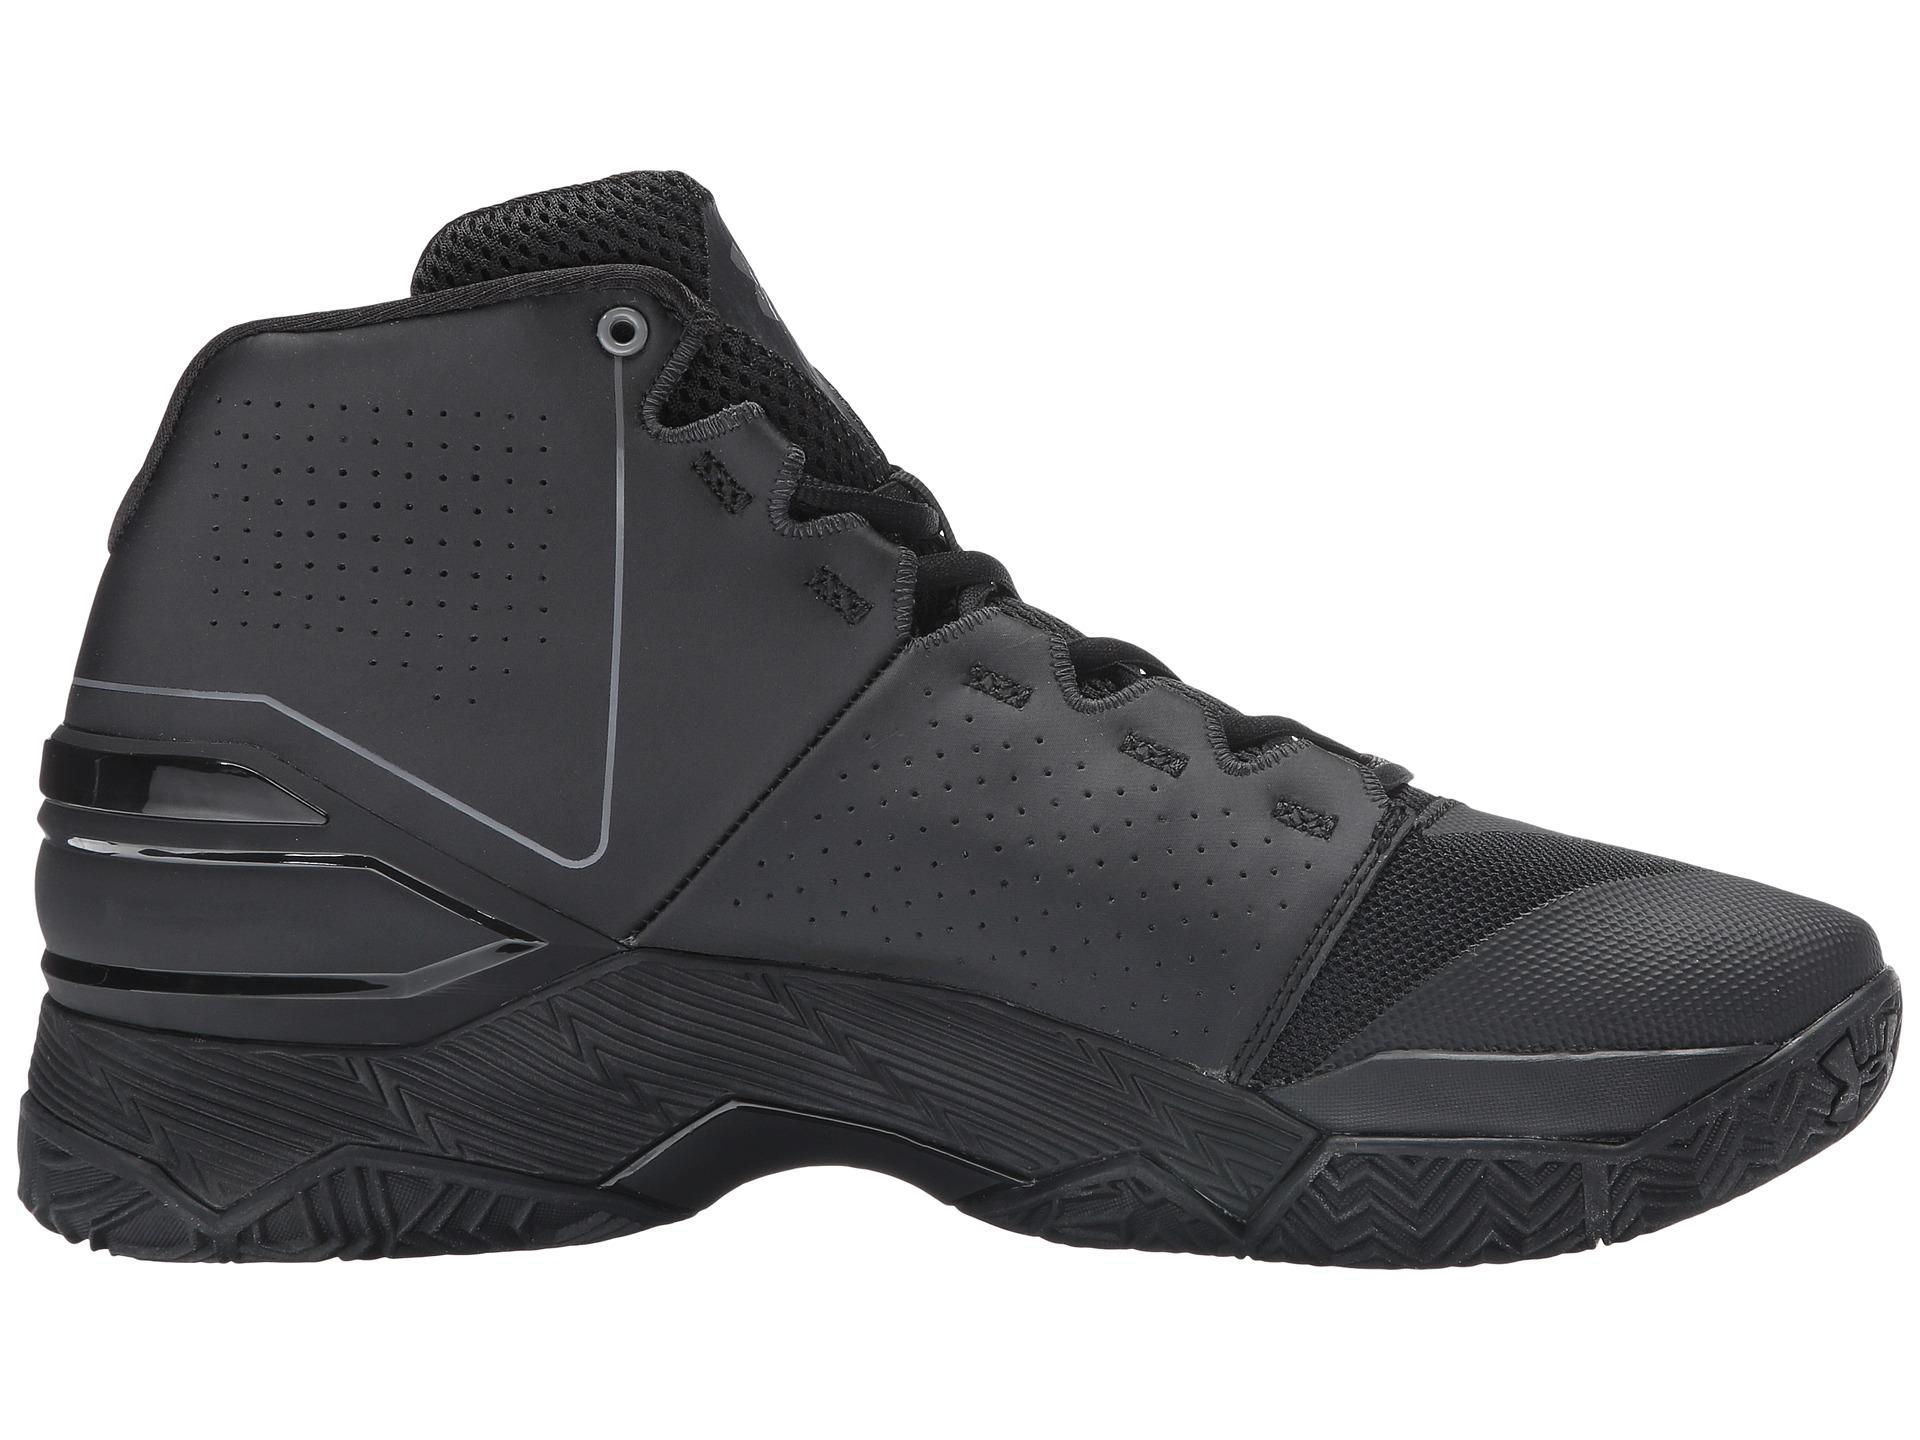 Rhino Black Lace Up Shoe Size   H